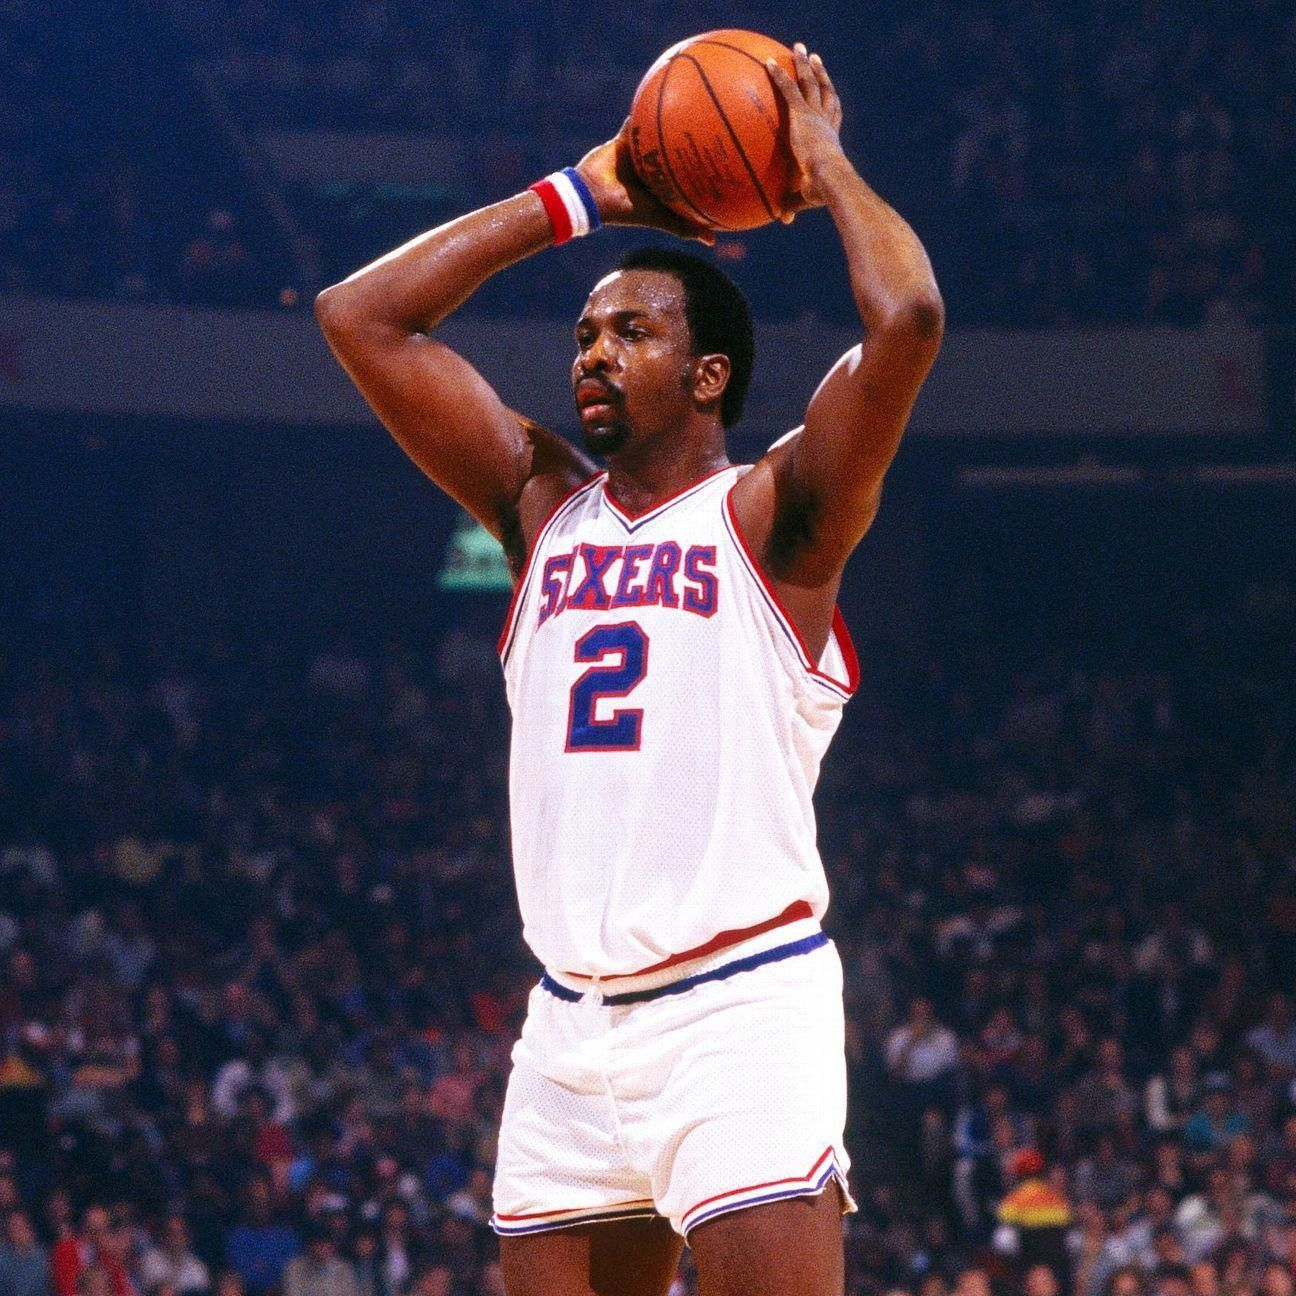 Basketball Legends Y8 Ncaasolutionbasketball Basketballplayers Nba Mvp Moses Malone Basketball Moves